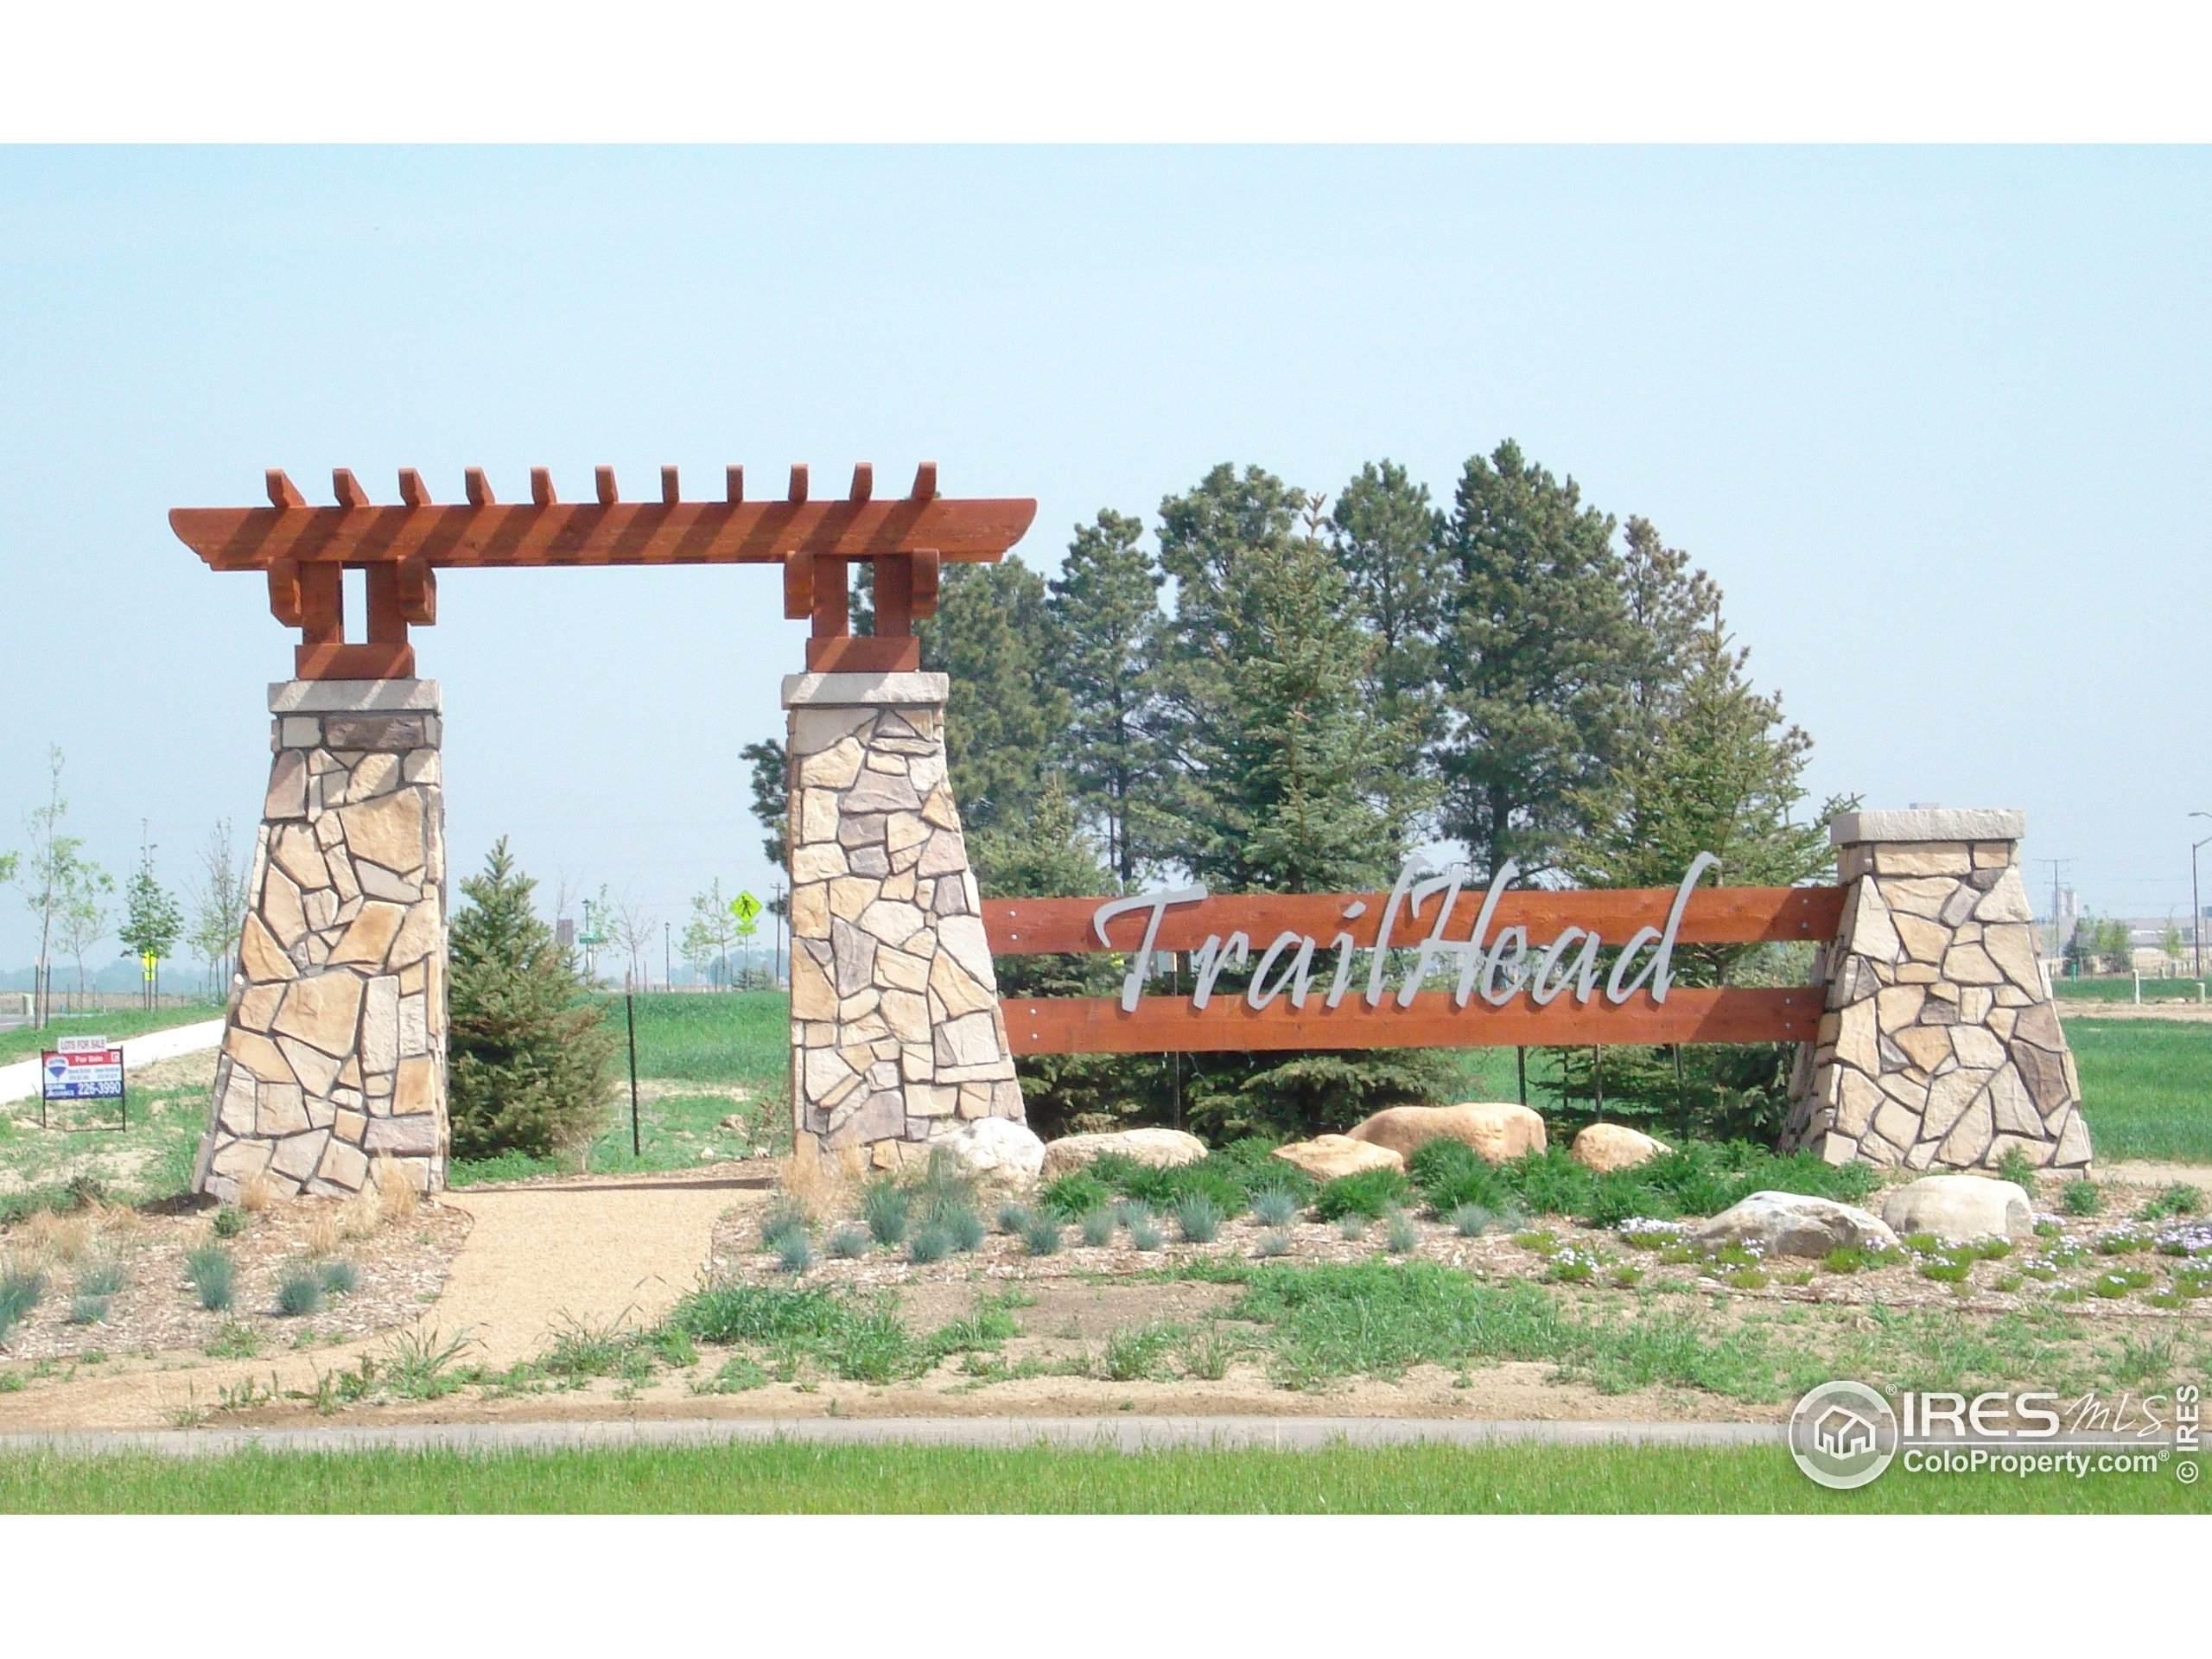 11719 Bradburn Blvd, Westminster, CO 80031 (MLS #919906) :: 8z Real Estate